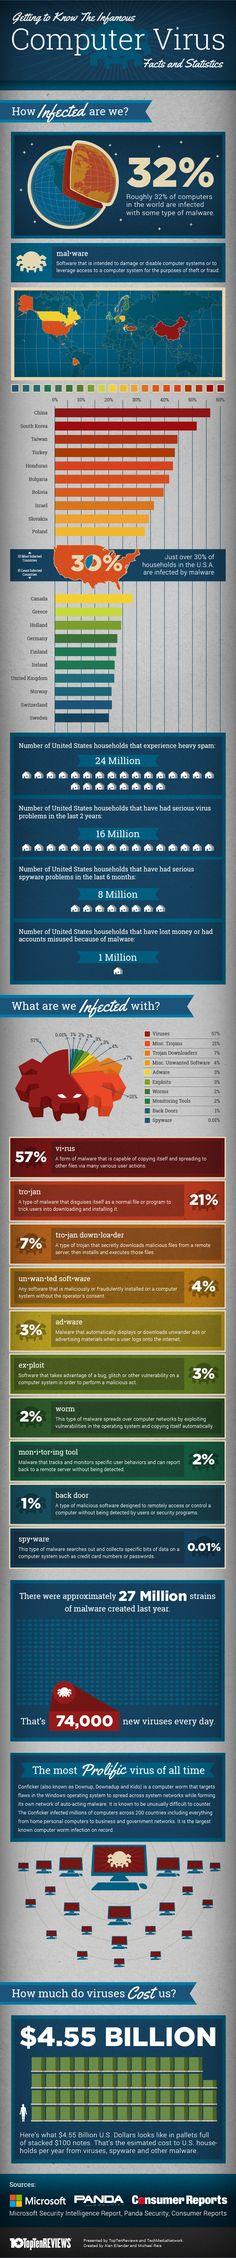 computer viruses infographic